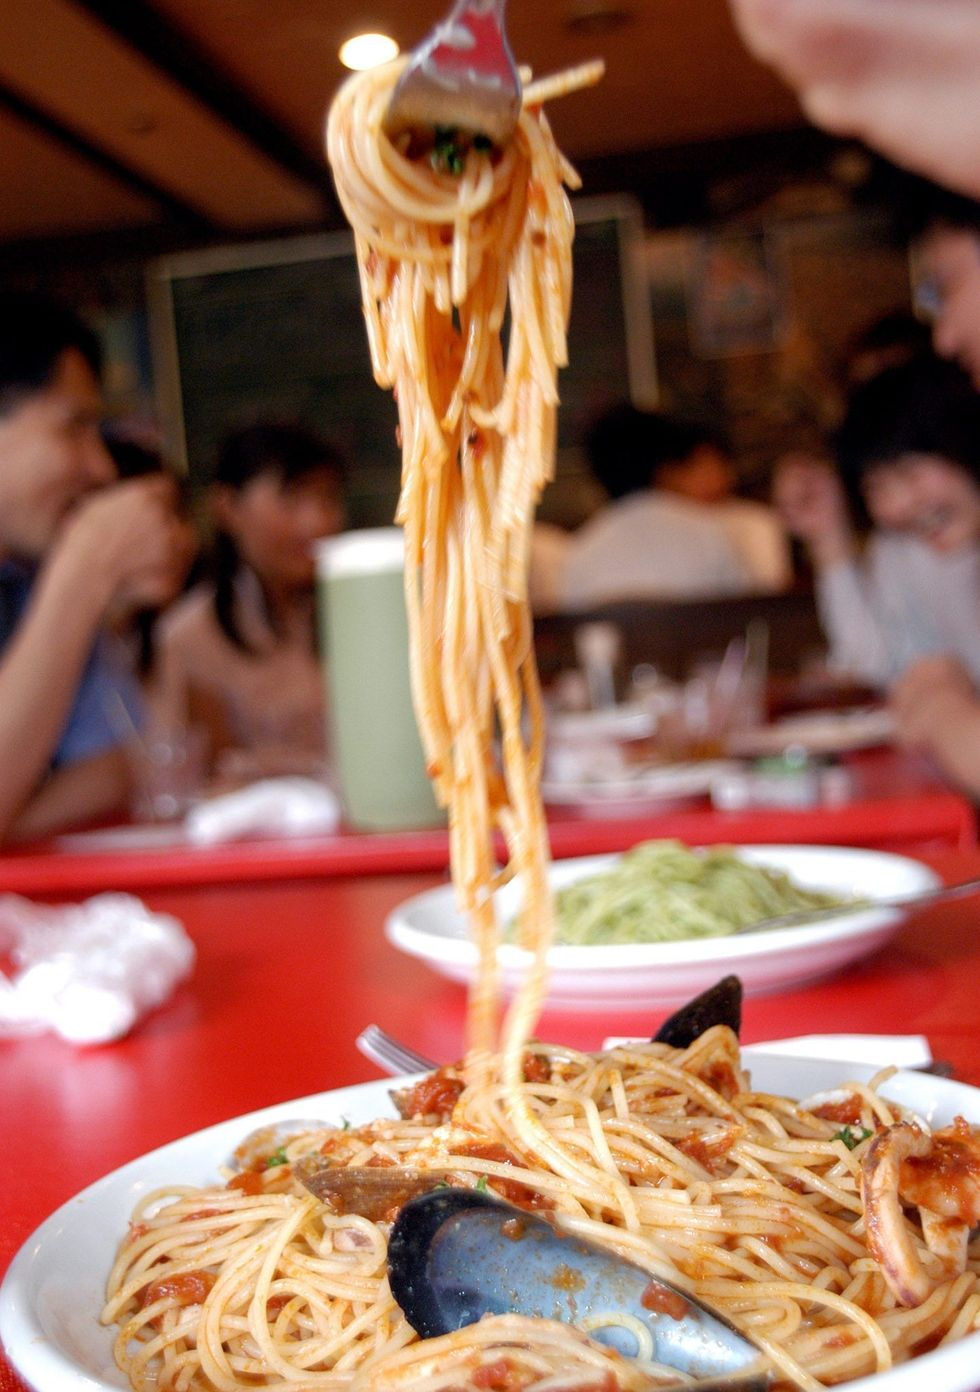 Gli spaghetti cucinati da Gian Carlo Fusco